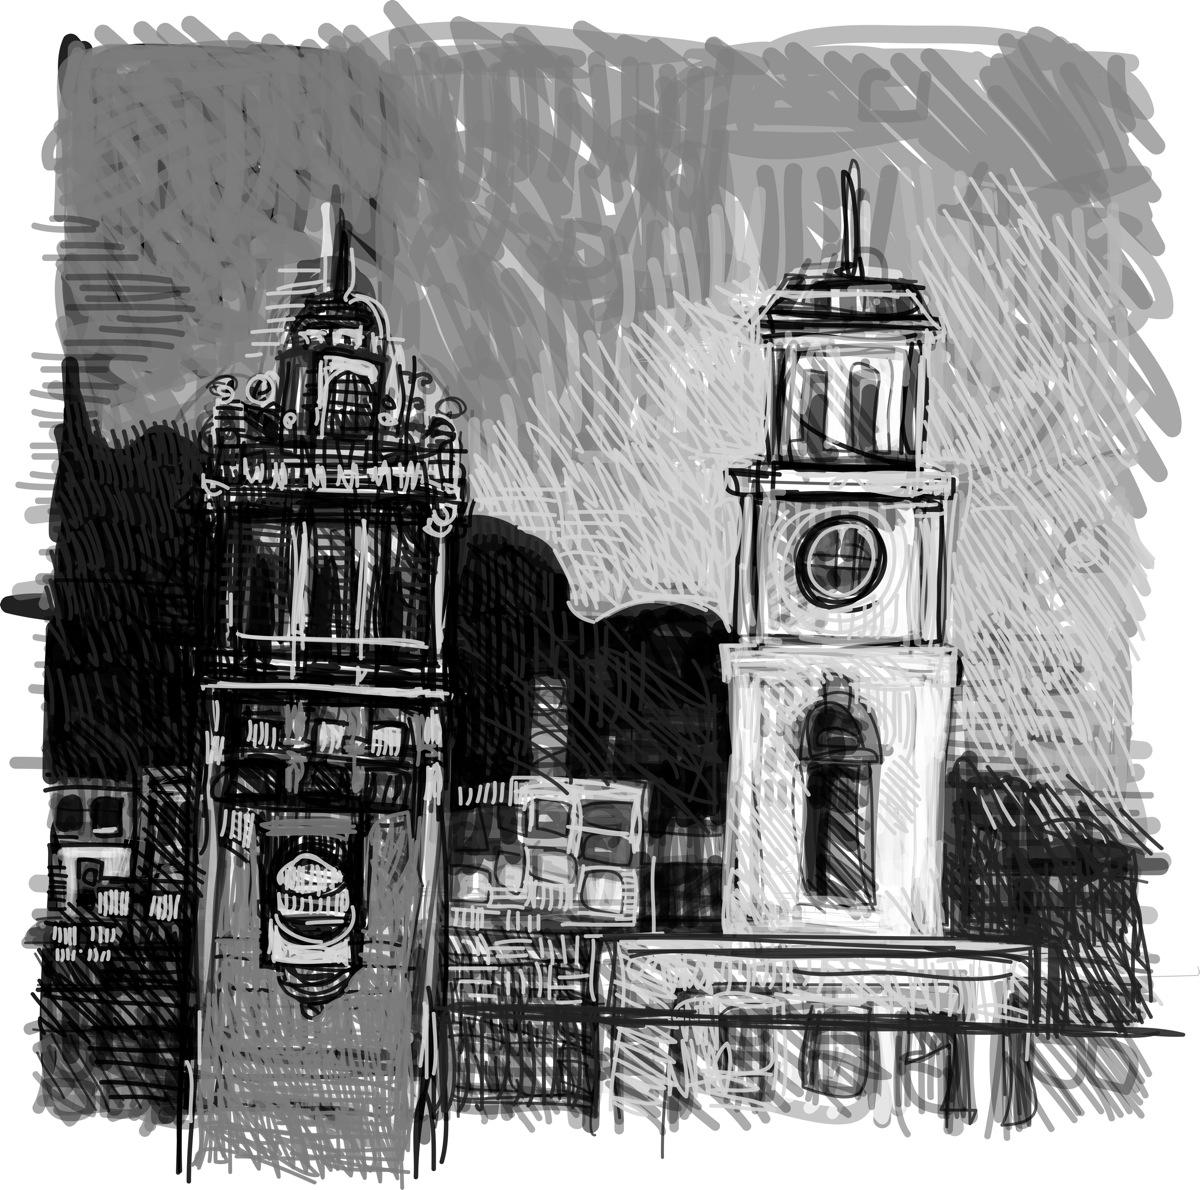 townhalls_of_154